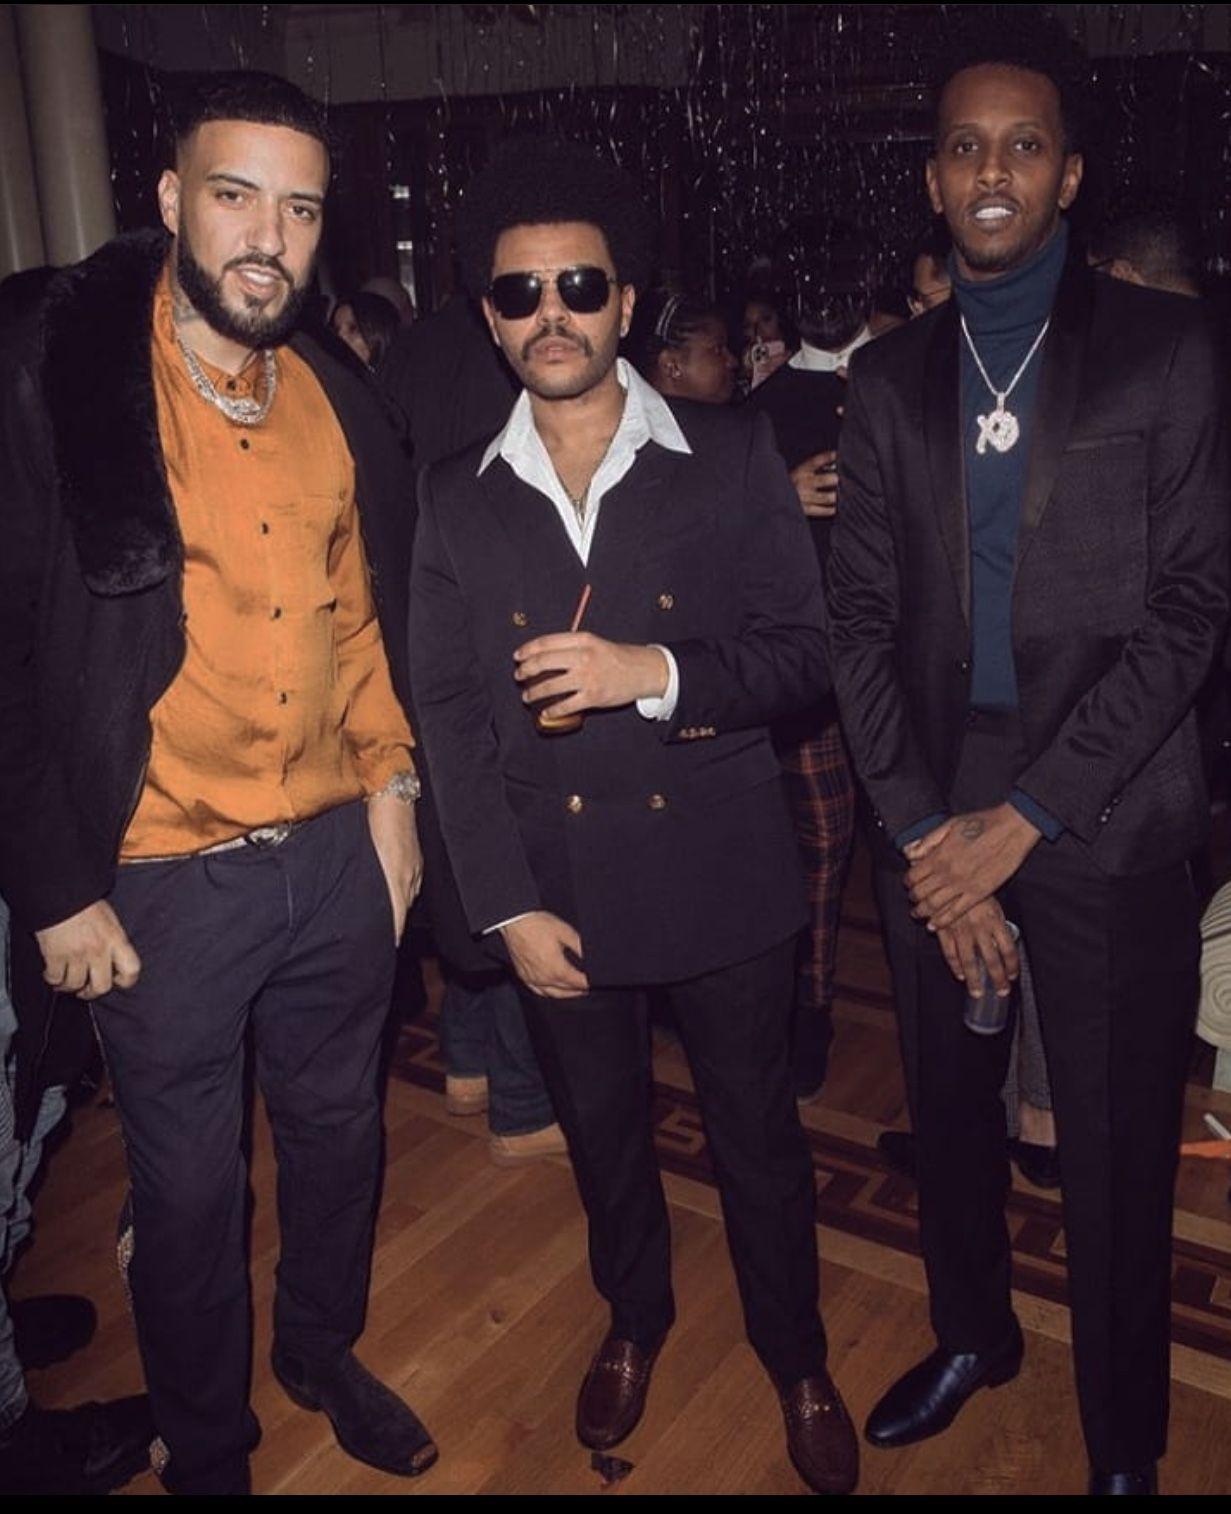 Pin By Cxorina On Abel The Weeknd Hip Hop Art Hip Hop Artists Hip Hop